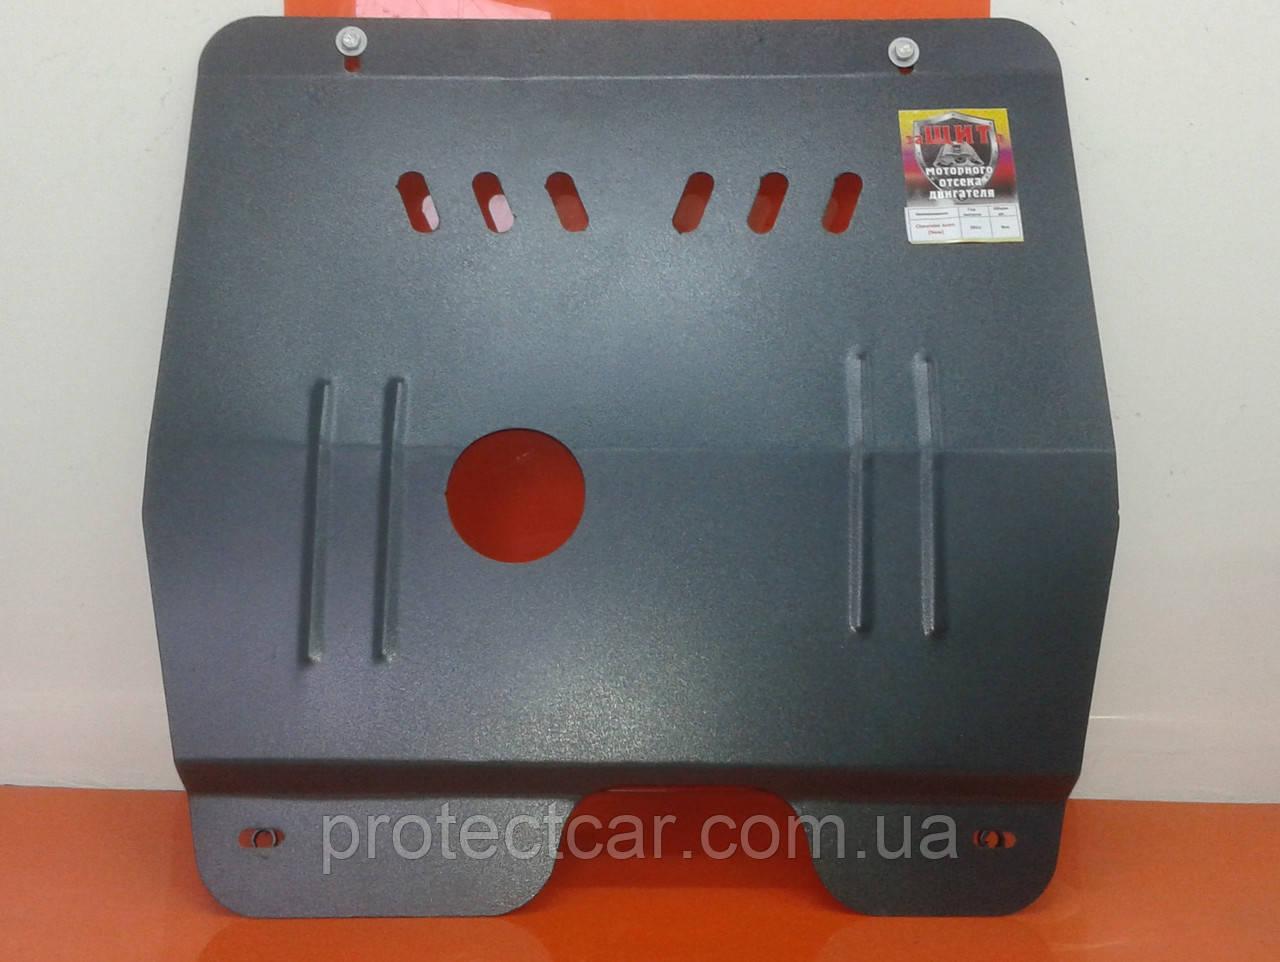 Защита двигателя Chevrolet AVEO T300 (с 2011 г.в.) Авео